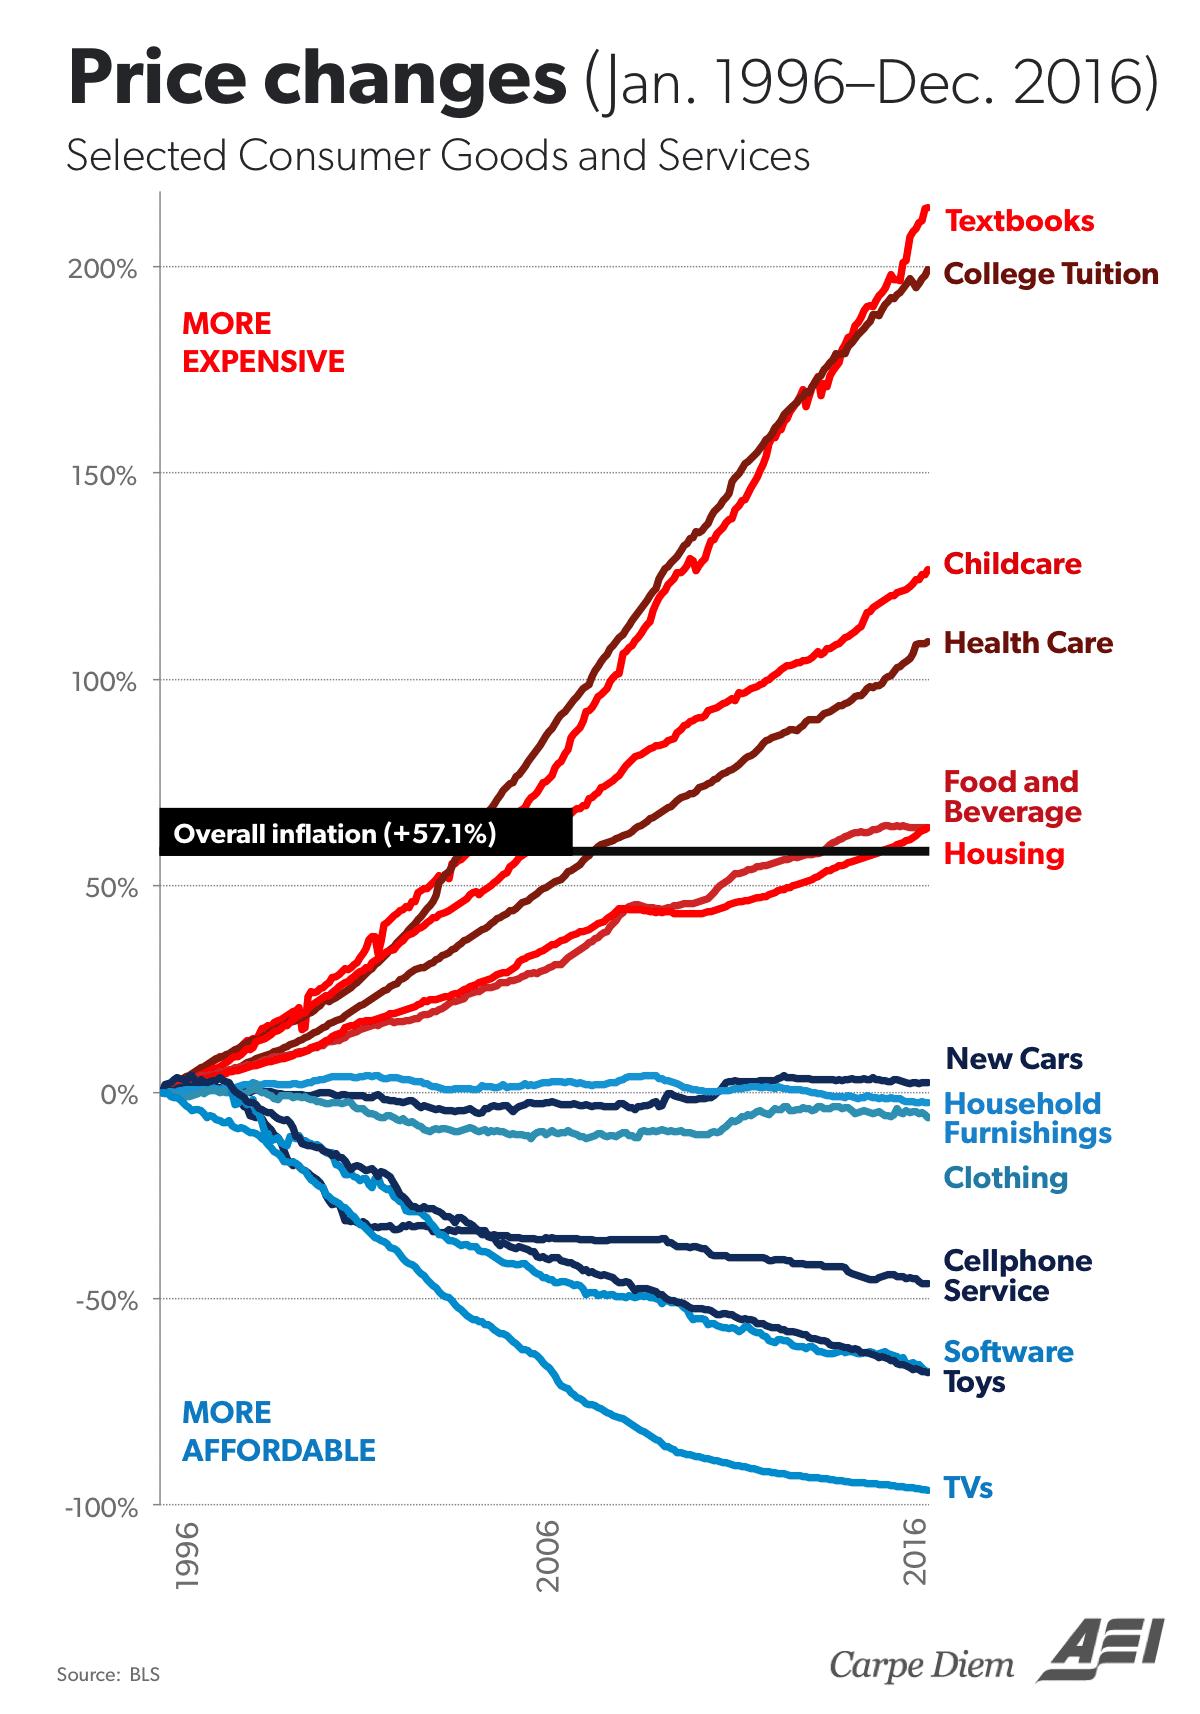 Rising costs 1996-2016 AEI Feb 2017